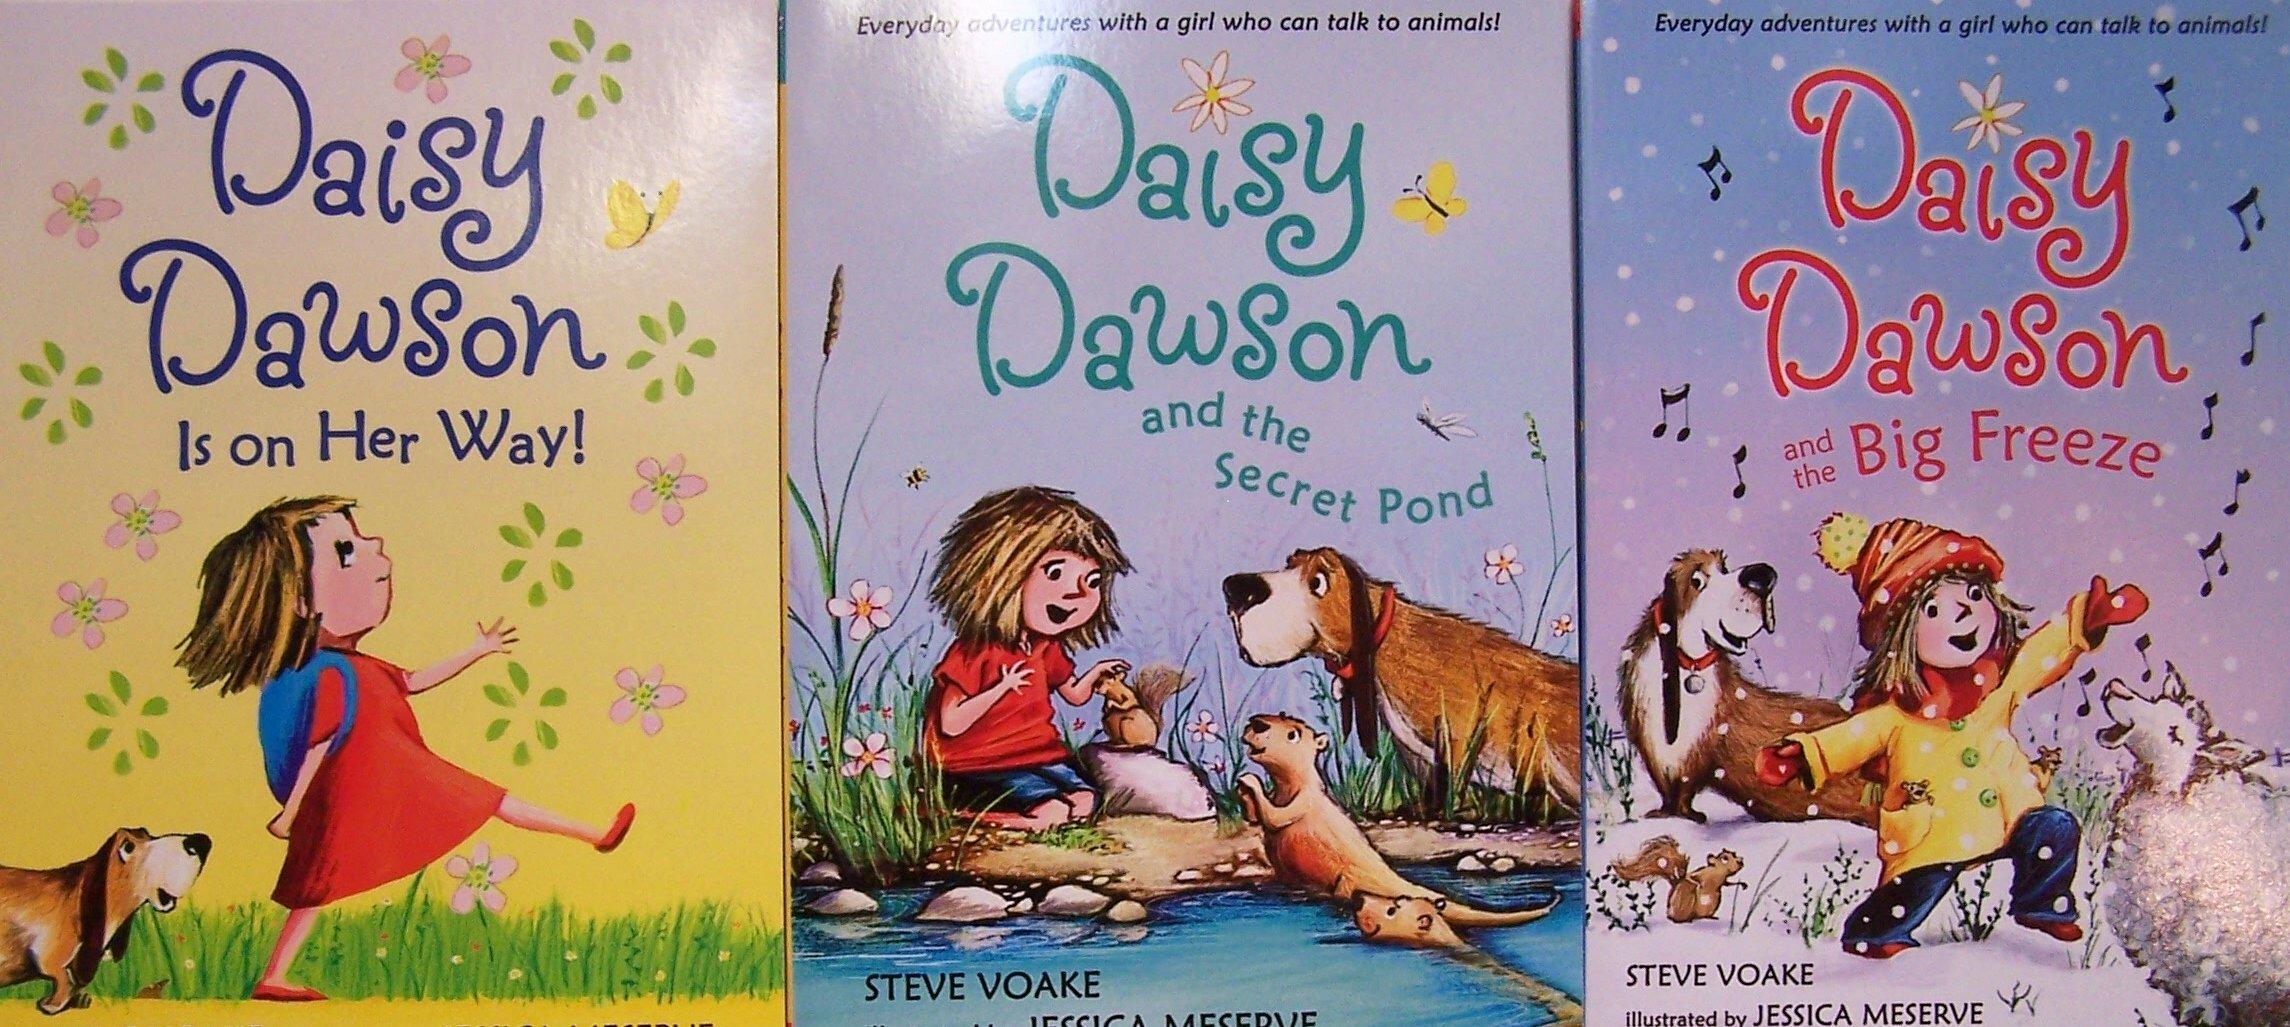 Daisy Dawson Pack - 3 Book Set (Daisy Dawson is On Her Way / Daisy Dawson  and the Big Freeze / Daisy Dawson and the Secret Pond): Steve Voake, ...